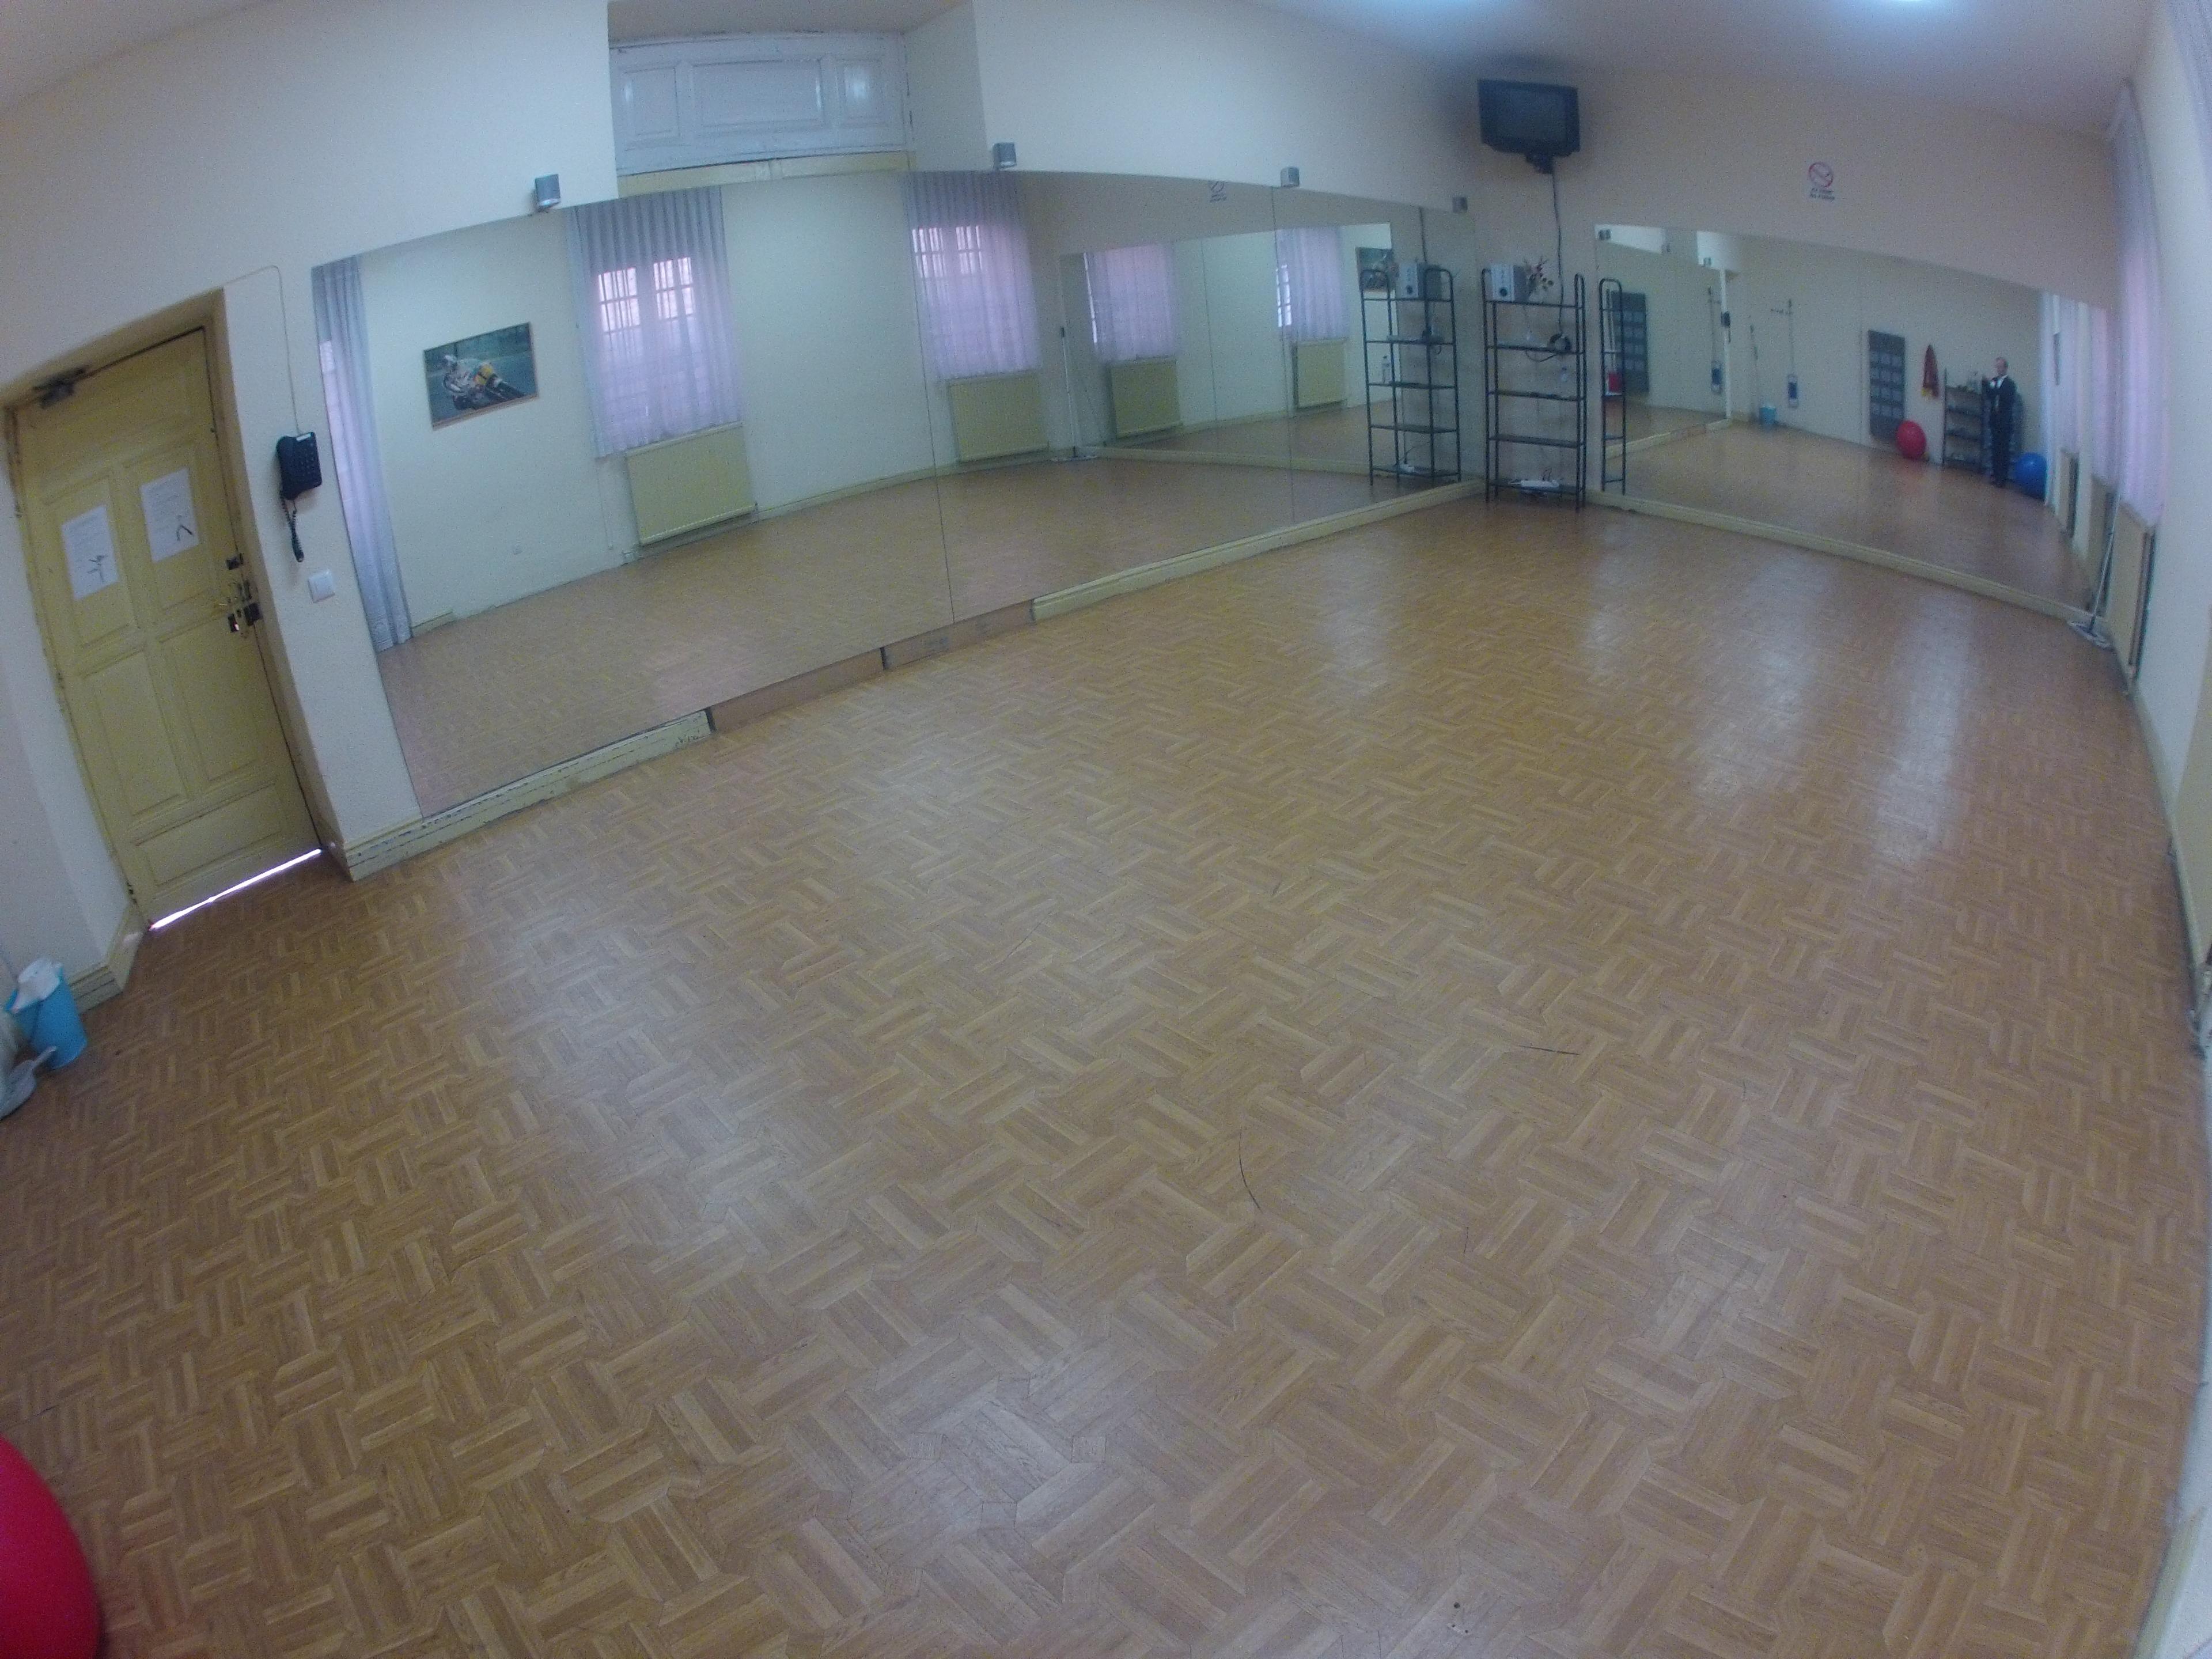 Residencia Universitaria SAN JOSE - Sala Baile